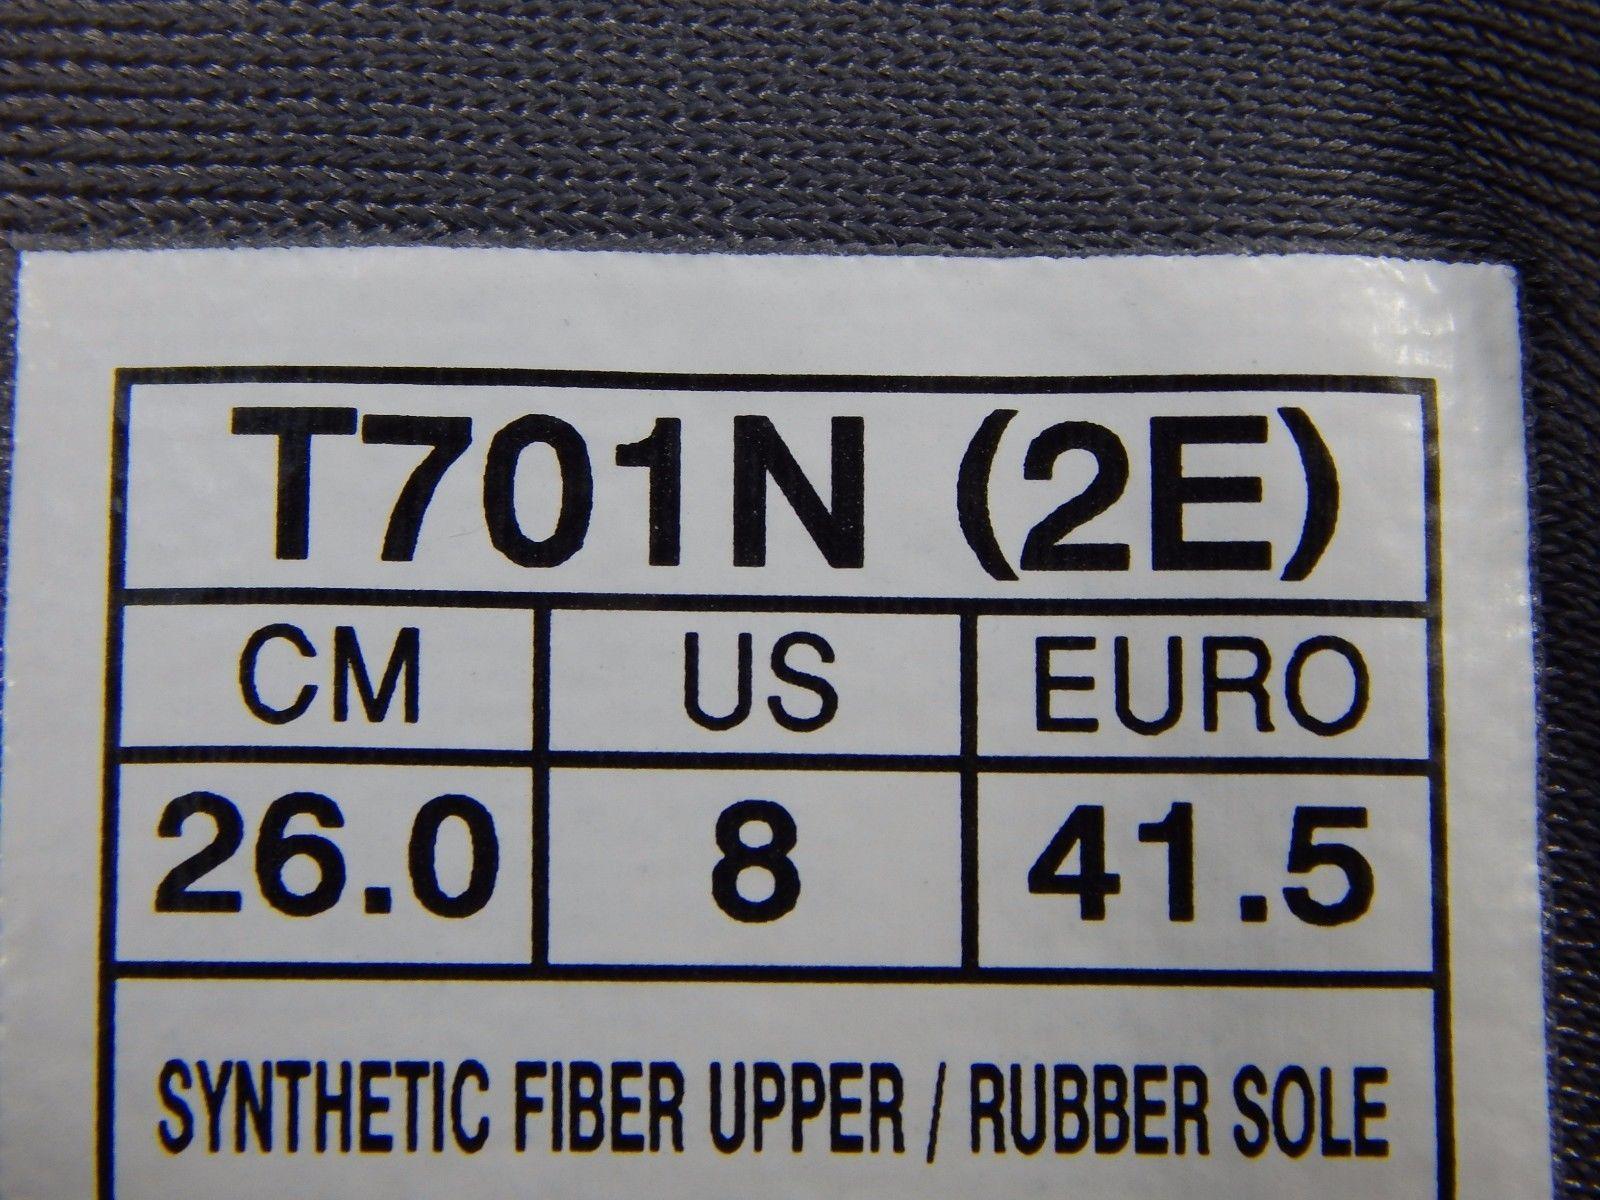 Asics Gel Nimbus 19 Men's Running Shoes Size US 8 2E WIDE EU 41.5  T701N (2E)